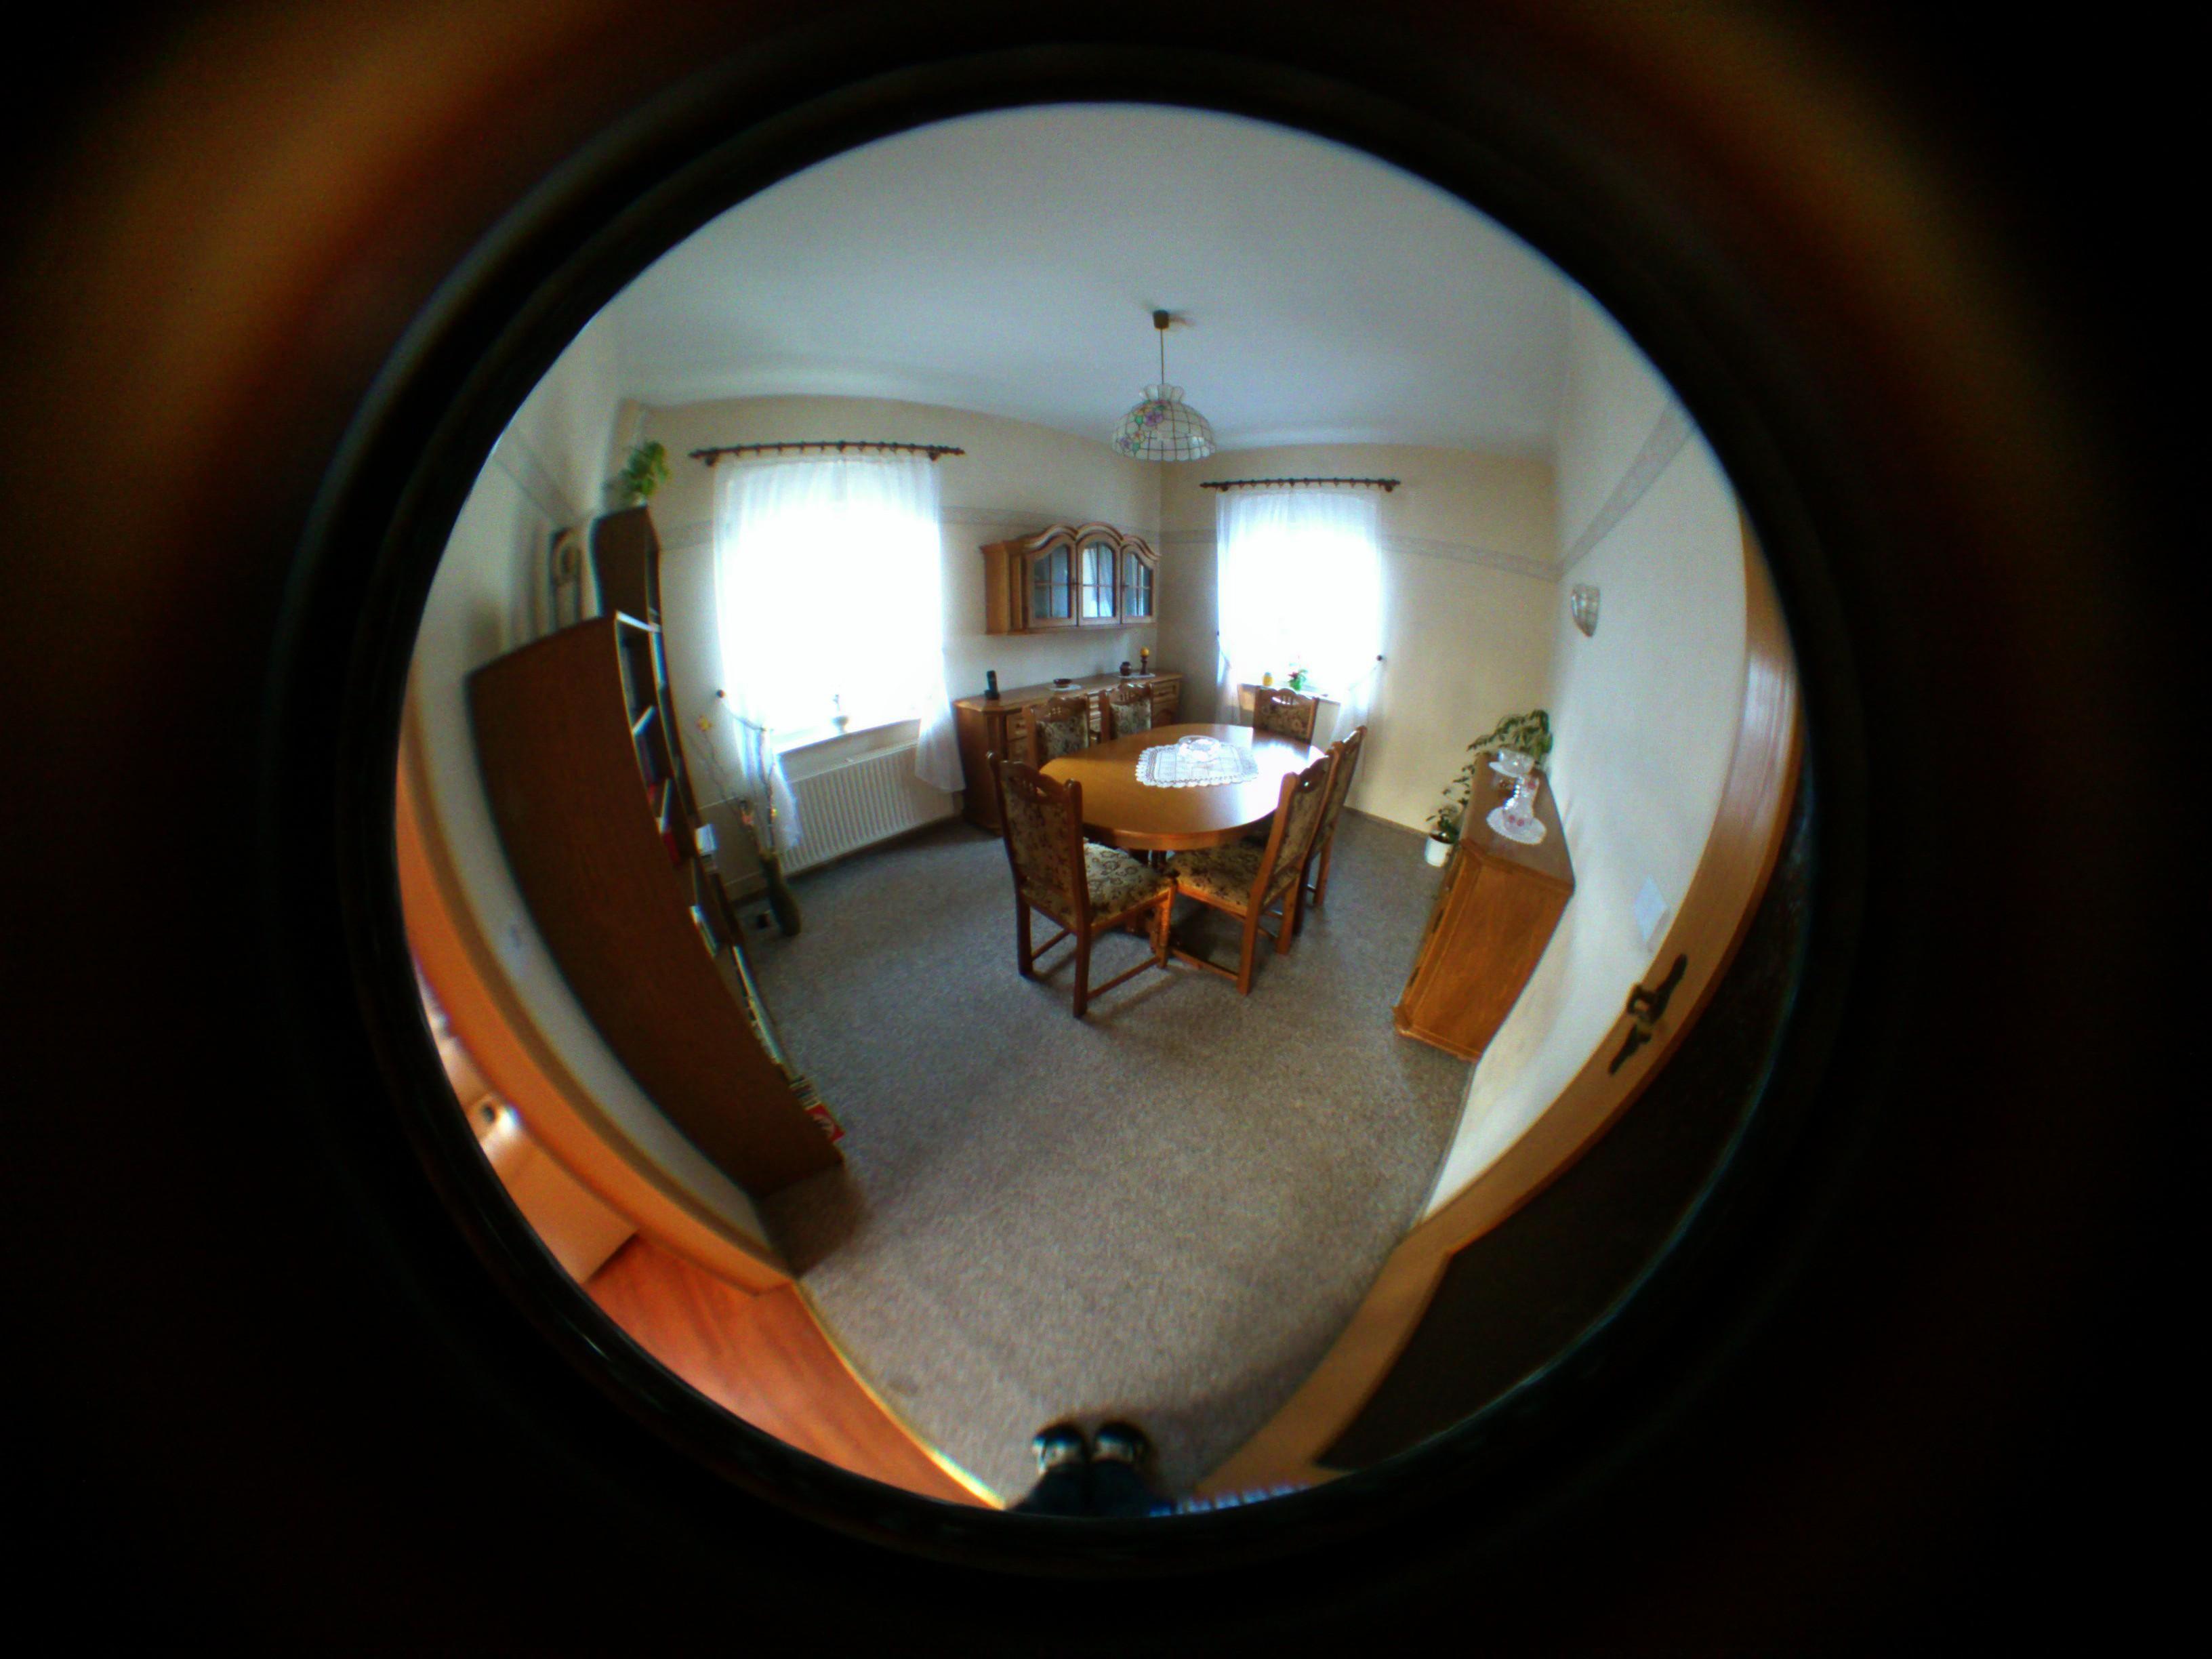 Lens real image images for Fish eye lense